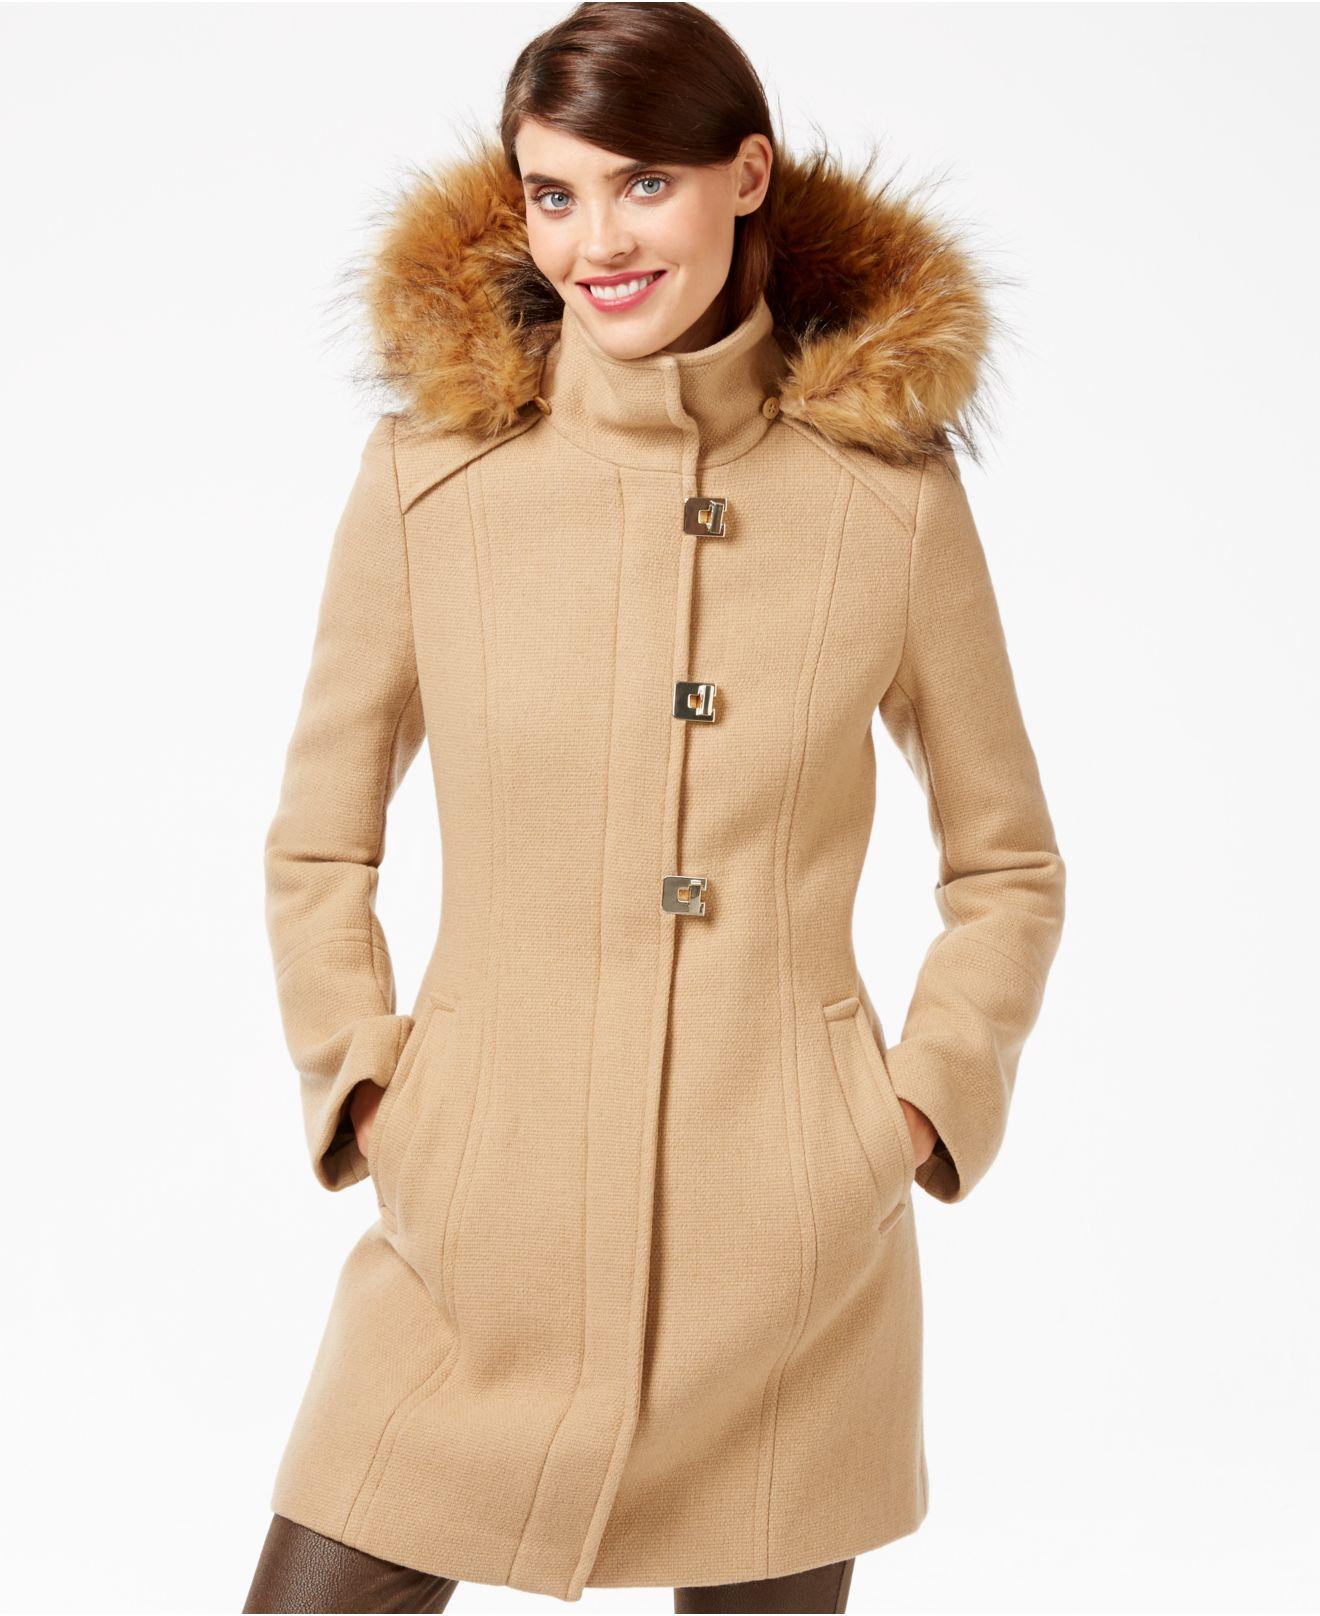 ... Lyst - Calvin Klein Faux-fur-trim Turn-lock Walker Coat in N ...